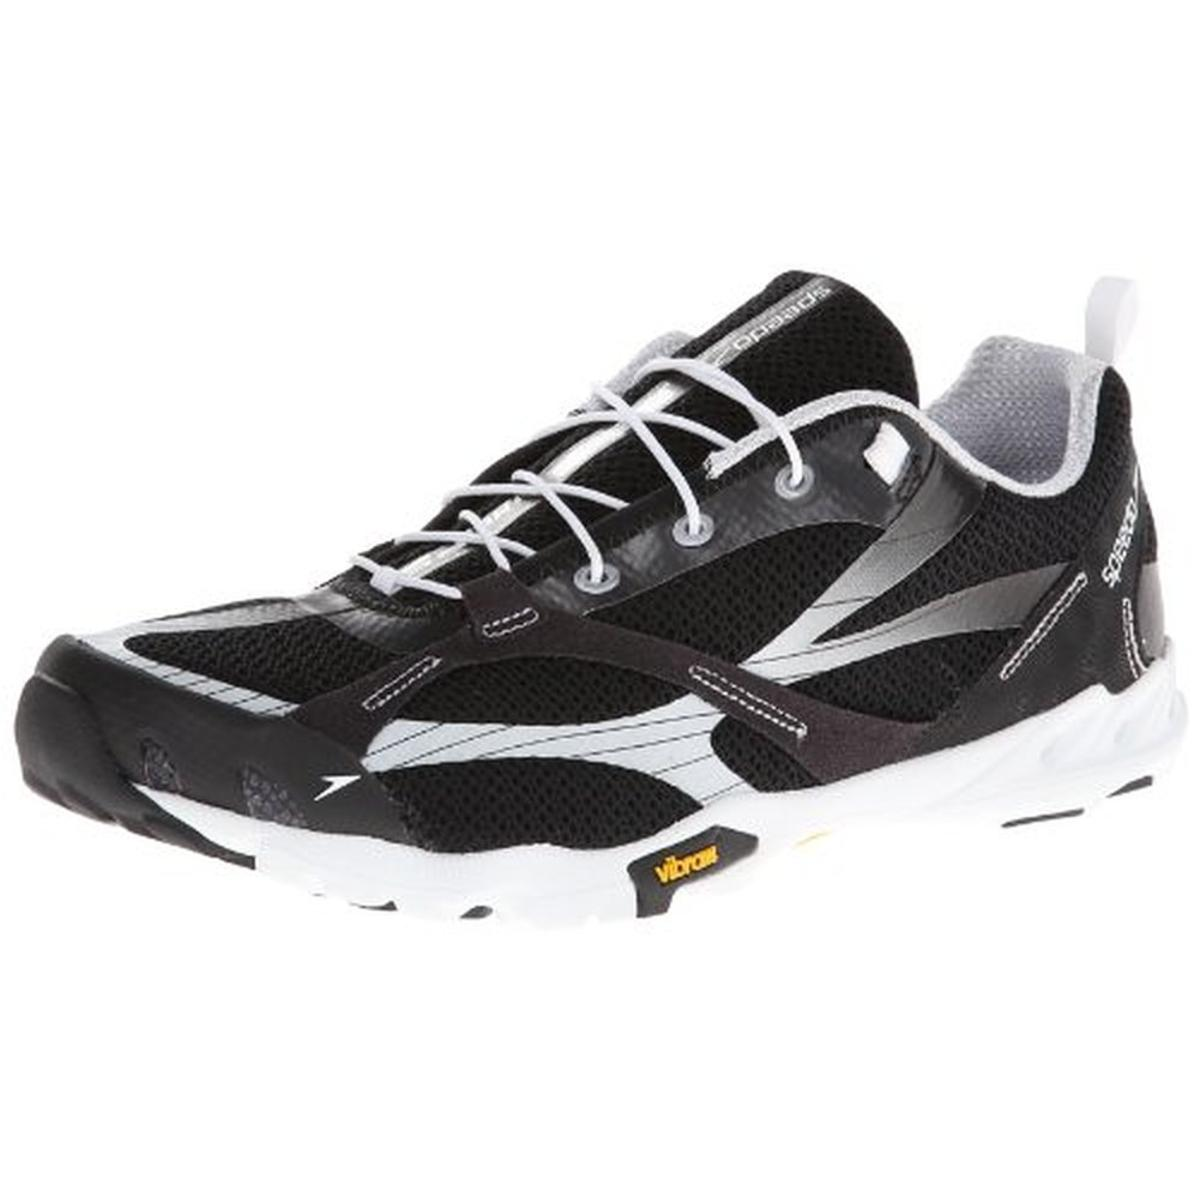 Speedo Mens FST Amphibious Mesh Lace-Up Water Shoes